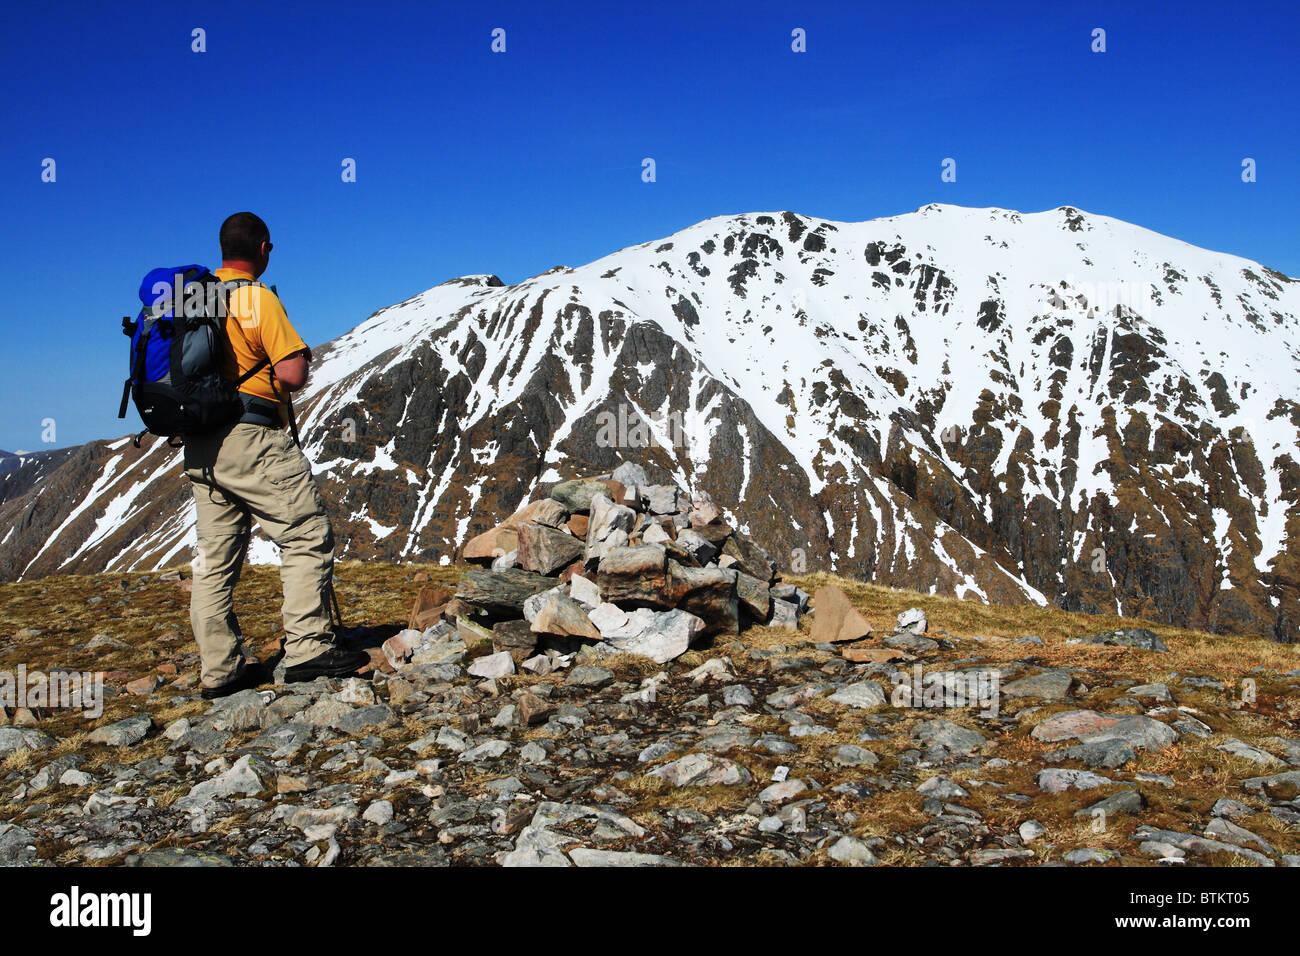 Hillwalker on the summit of Beinn Maol Chaluim looking across to Bidean nam Bian. - Stock Image